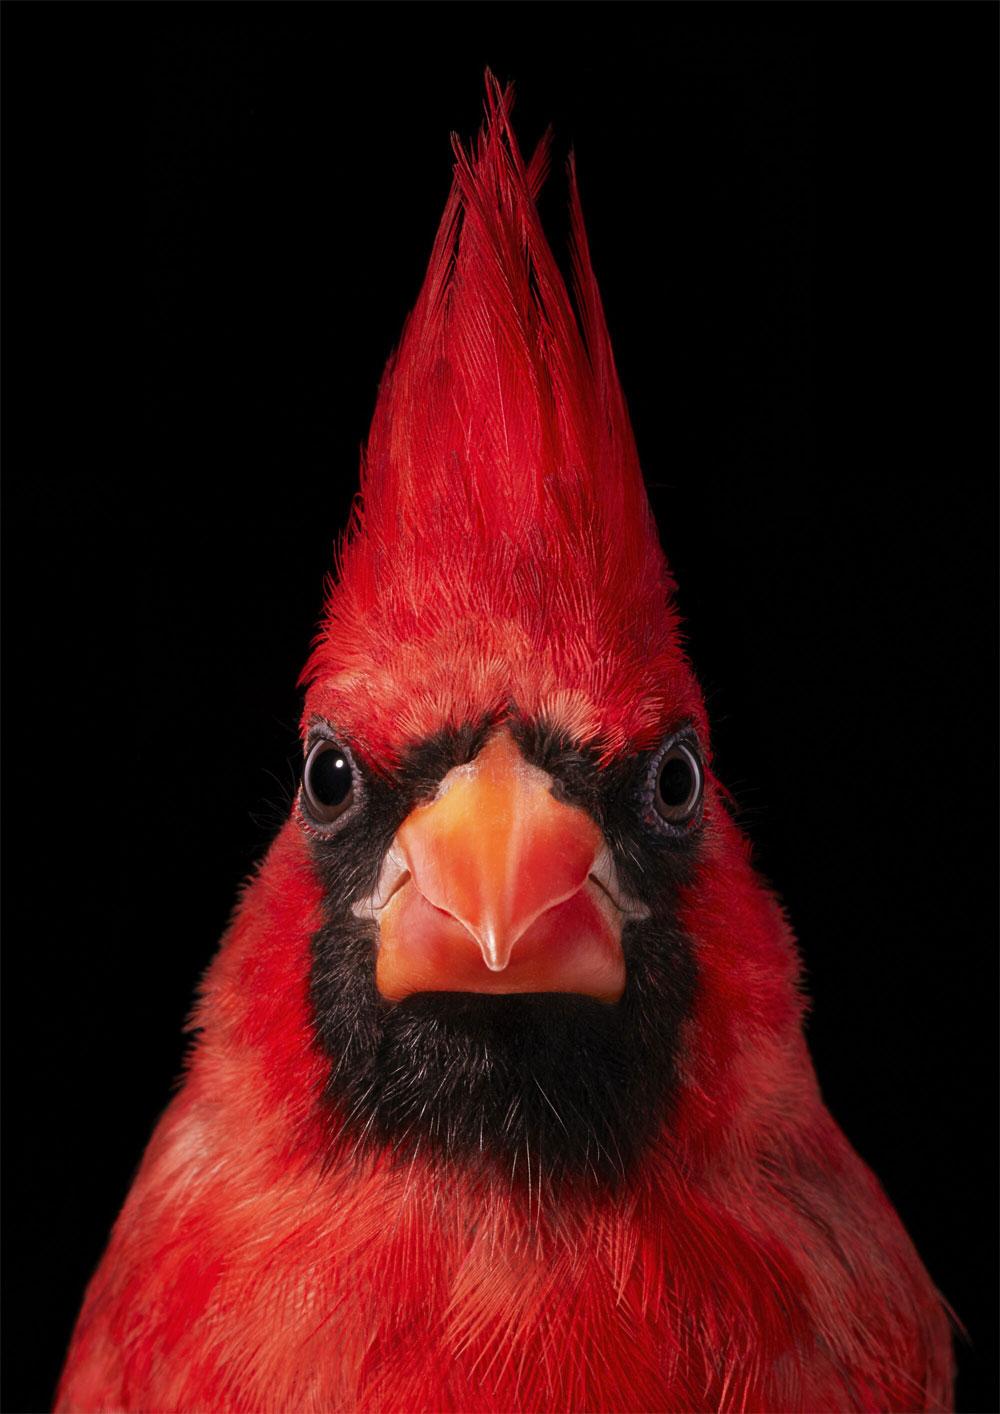 Virginia Cardinal bird © Tim Flach.